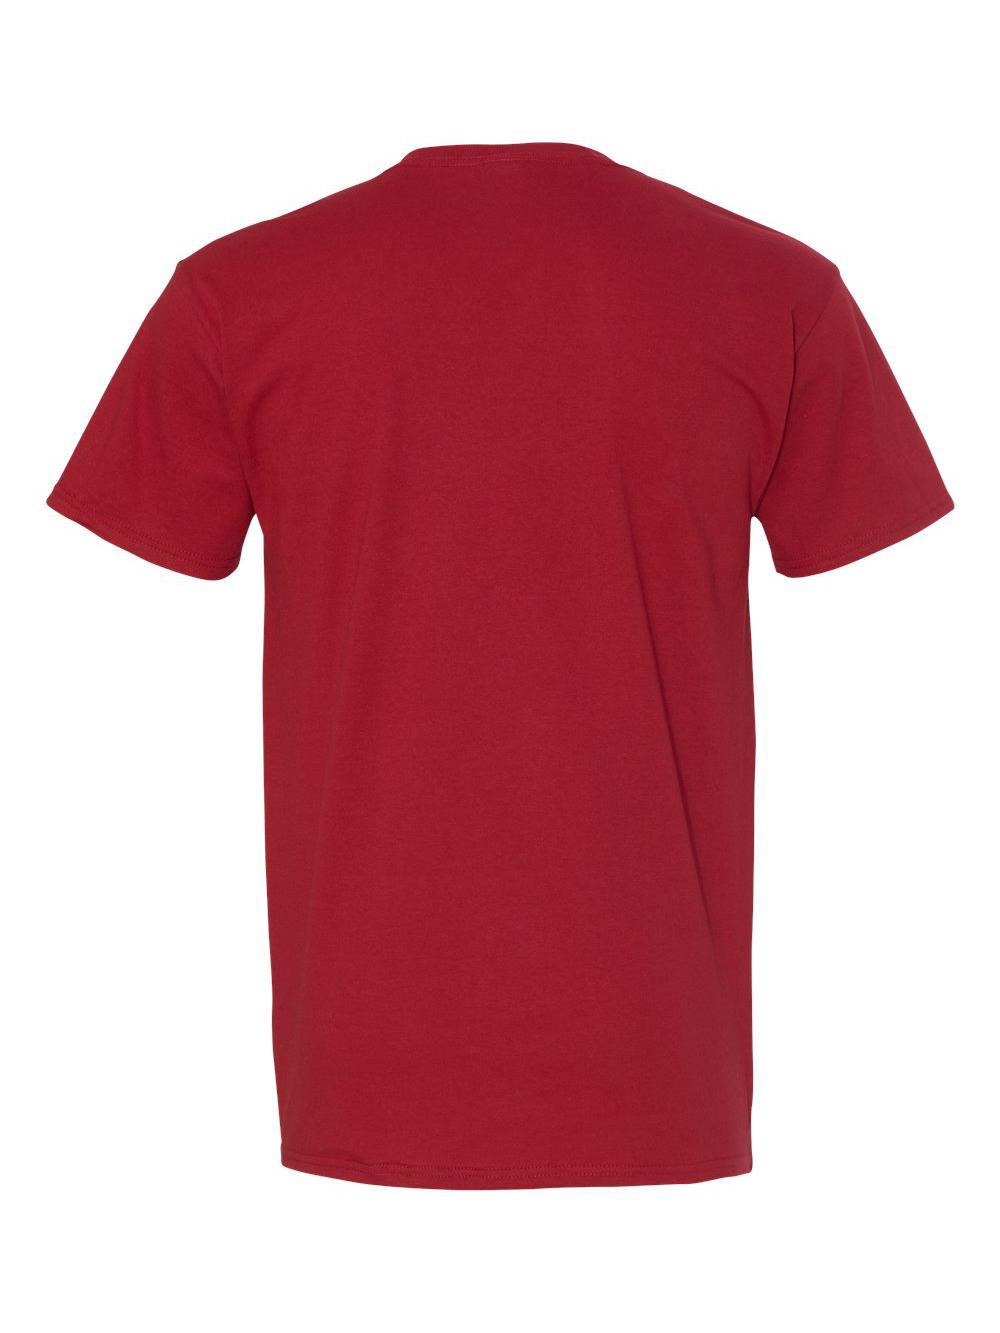 Fruit-of-the-Loom-HD-Cotton-Short-Sleeve-T-Shirt-3930R thumbnail 40